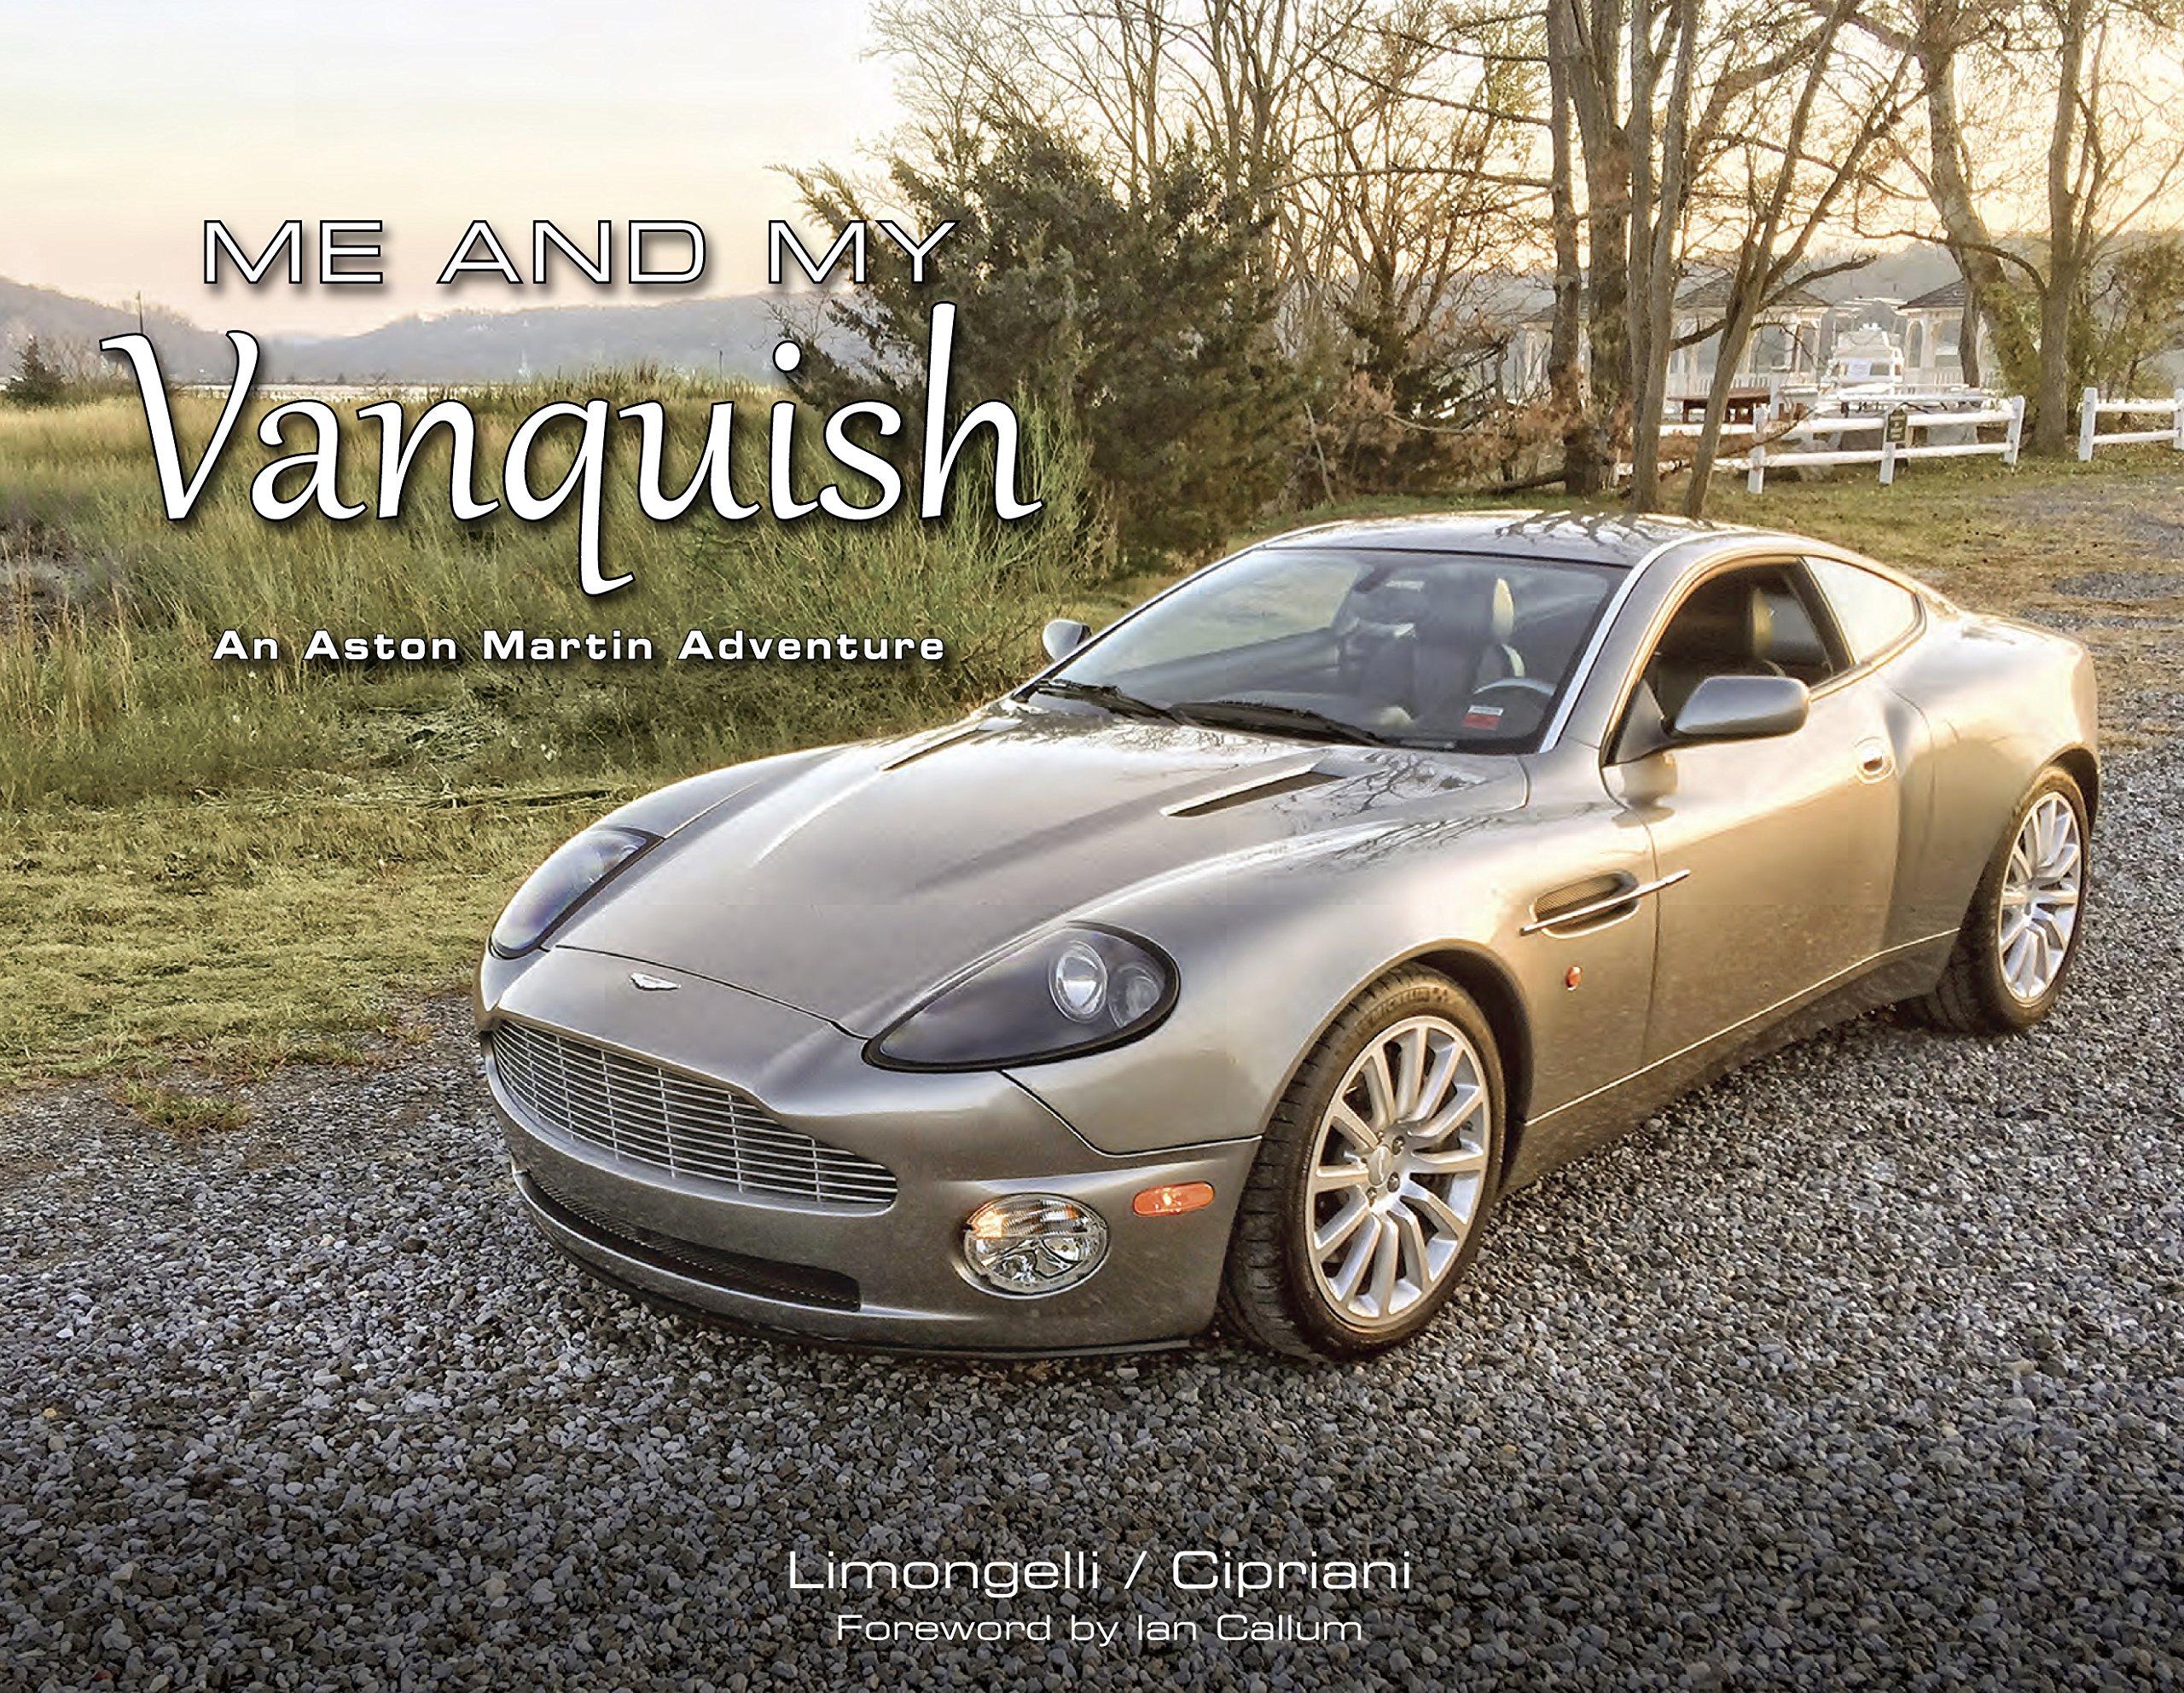 Me And My Vanquish An Aston Martin Adventure Joseph V Limongelli - Aston martin near me